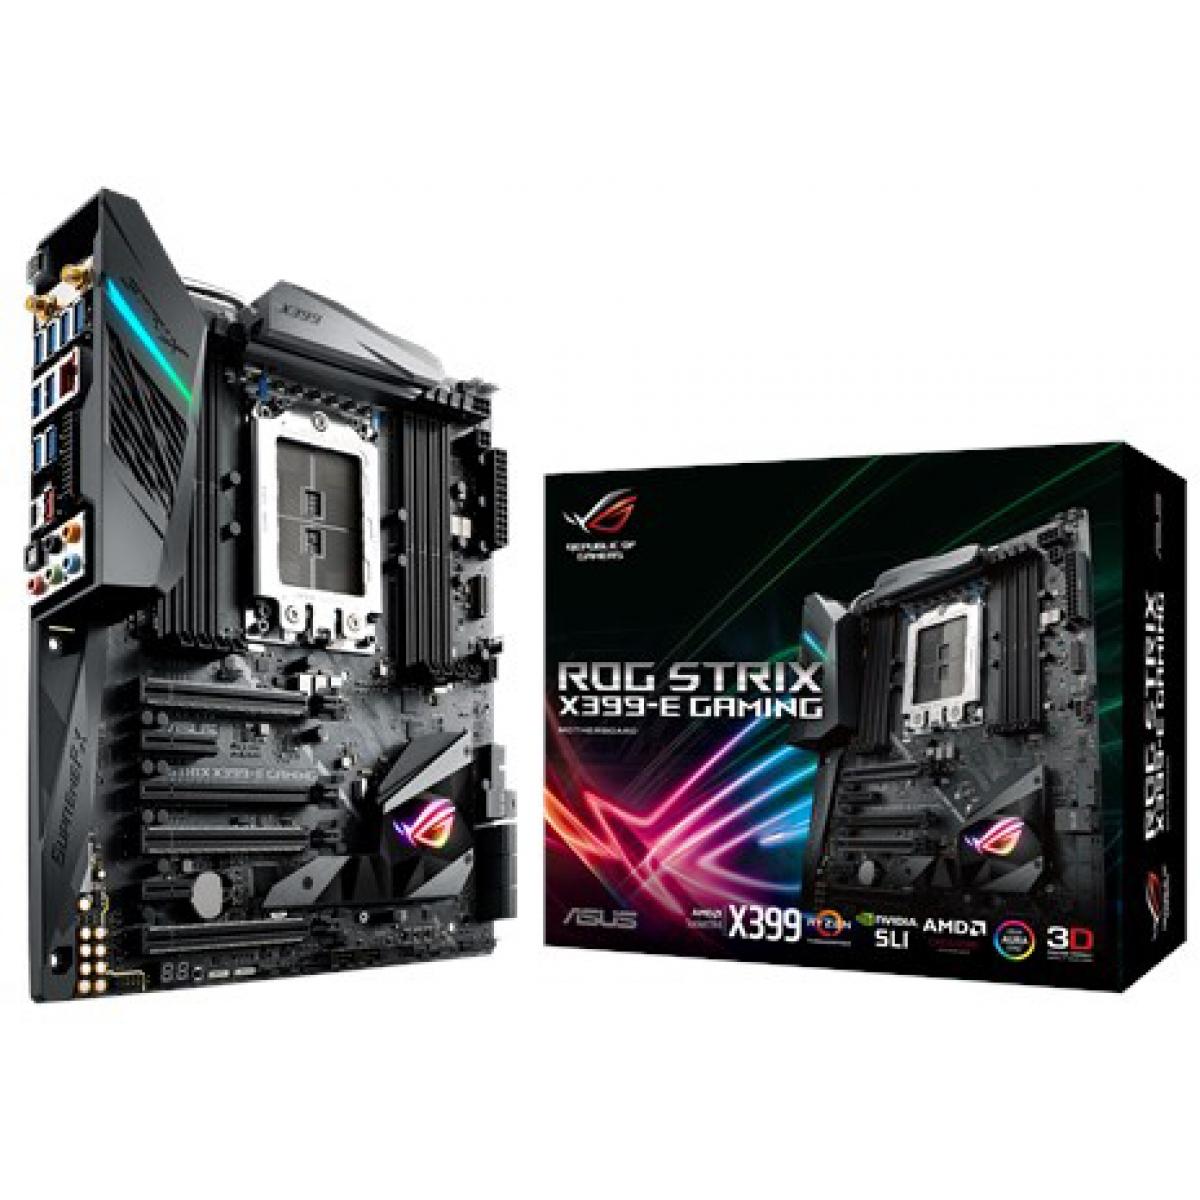 Placa Mãe Asus Rog Strix X399-E Gaming, Chipset X399, AMD TR4, E-ATX, DDR4